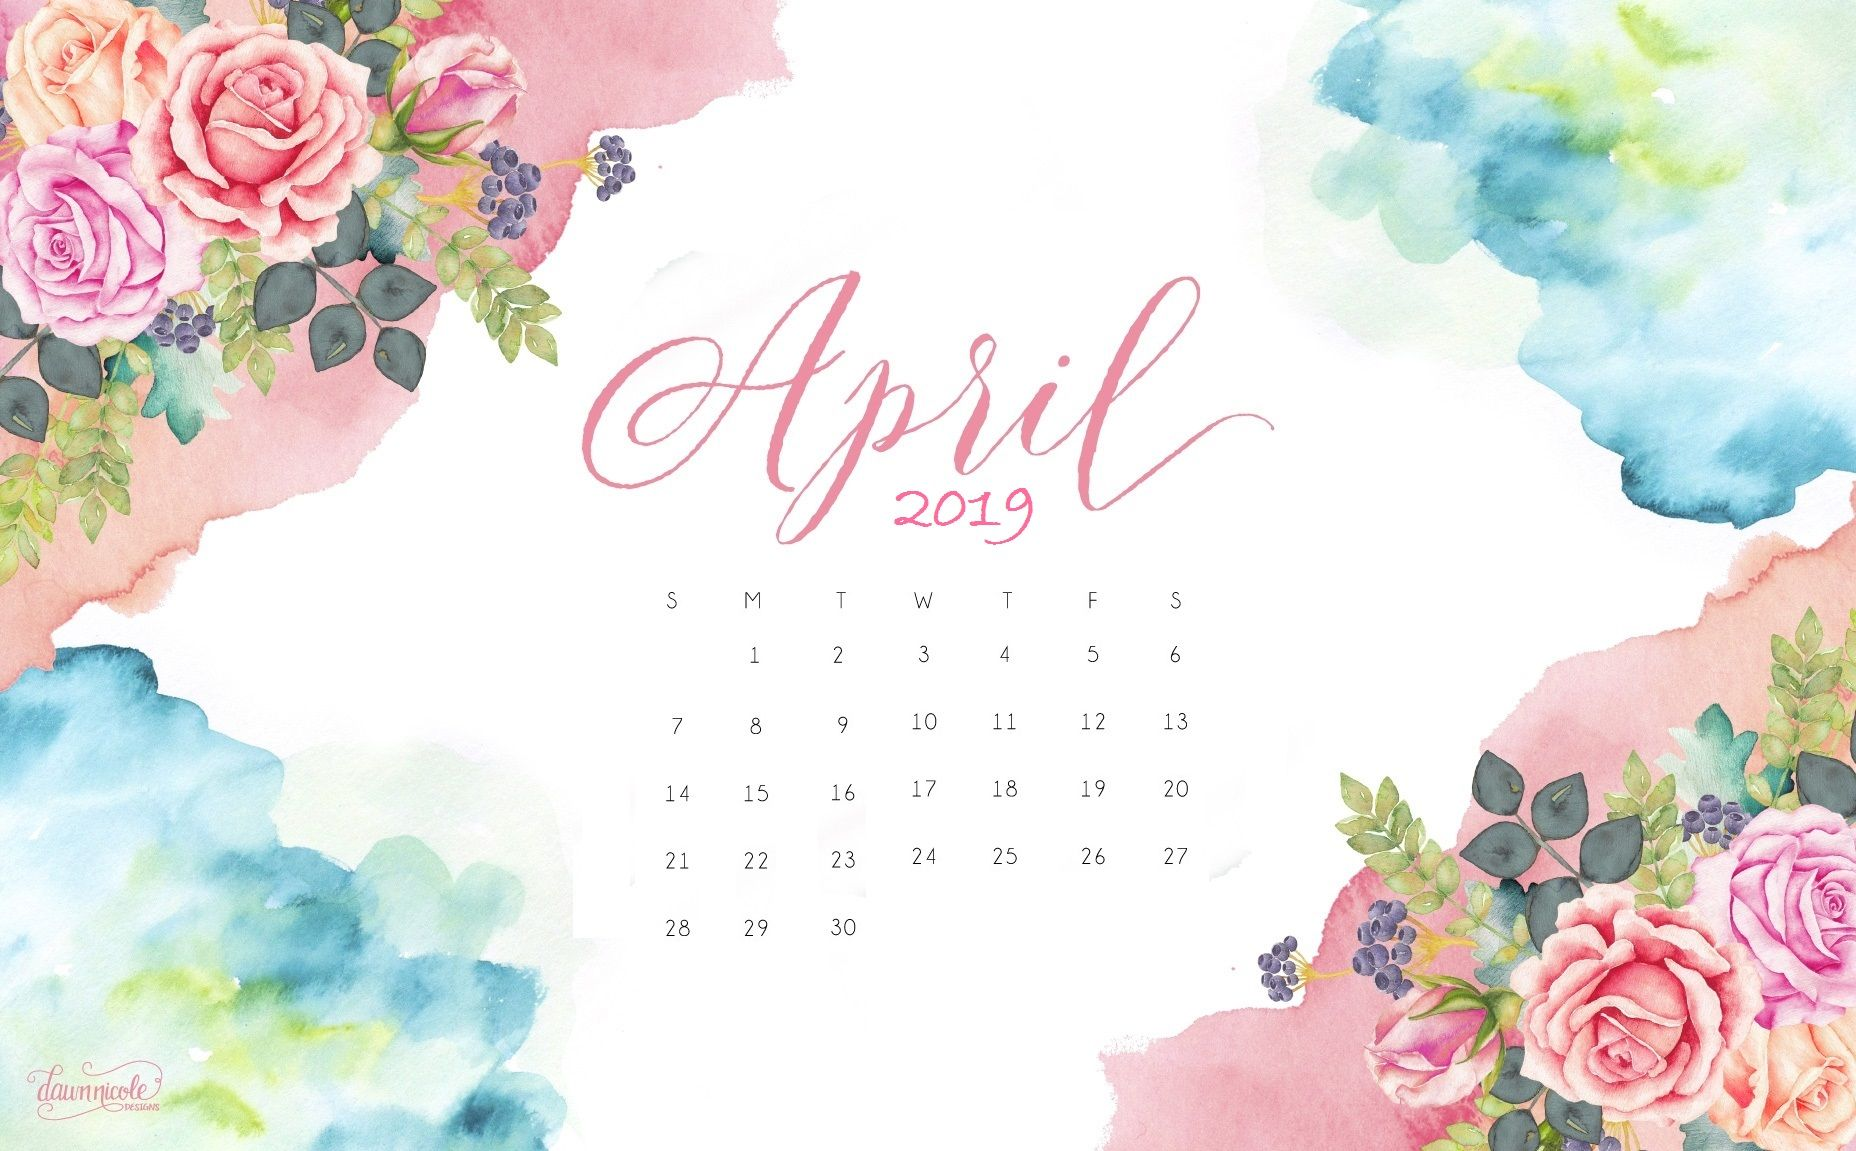 April 2019 Wallpaper Calendar Calendar Wallpaper Desktop Wallpaper Calendar Desktop Calendar